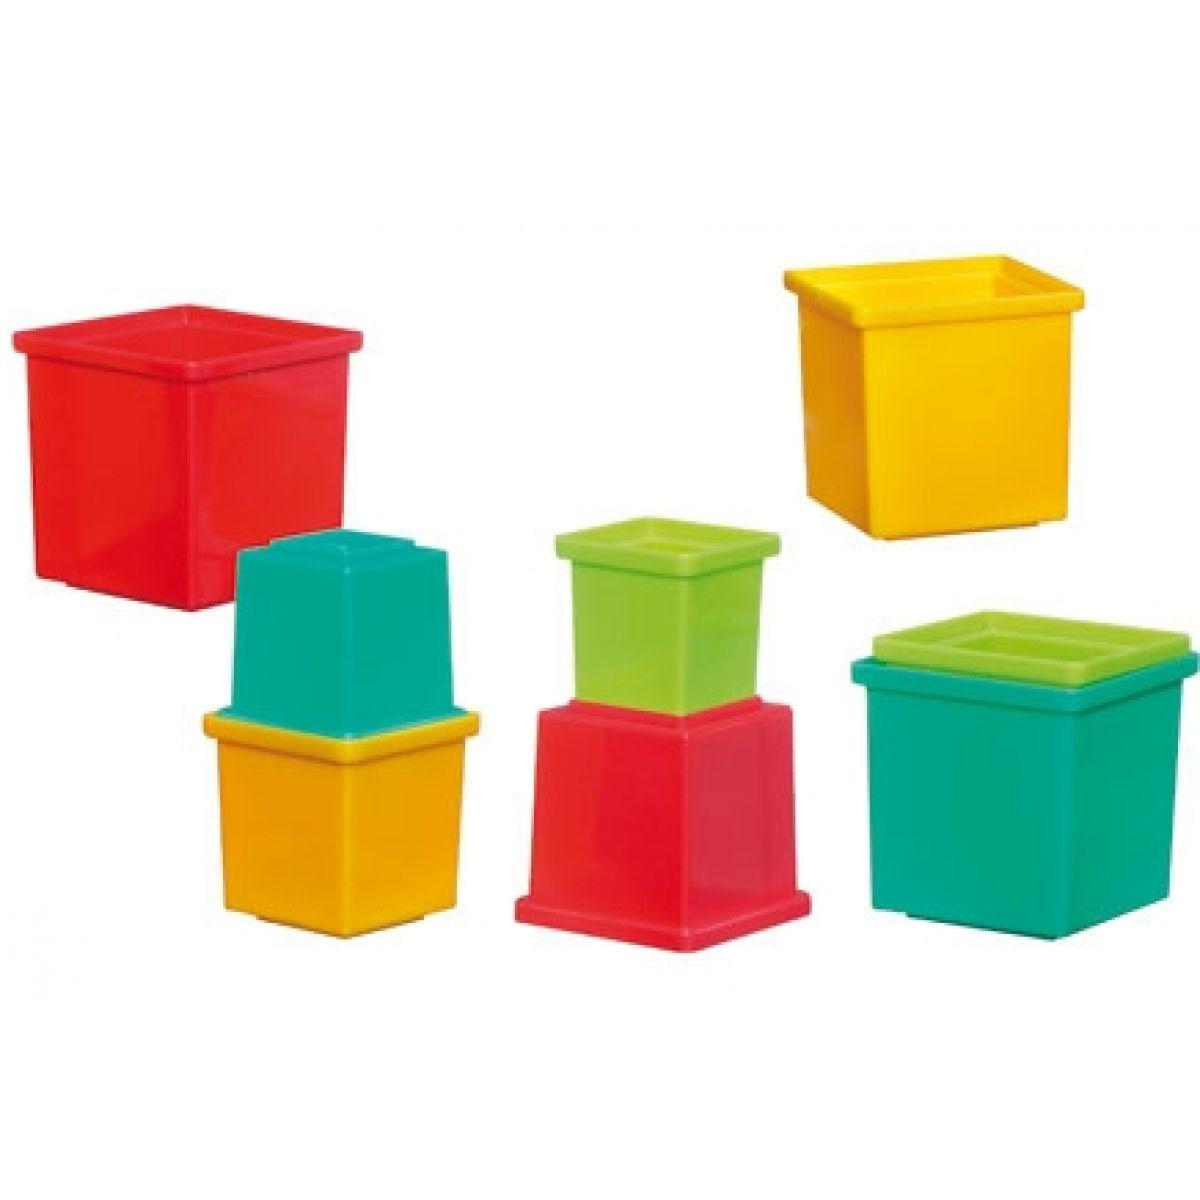 Hasbro 16810148 - Hrací set barevné kostky Playskool